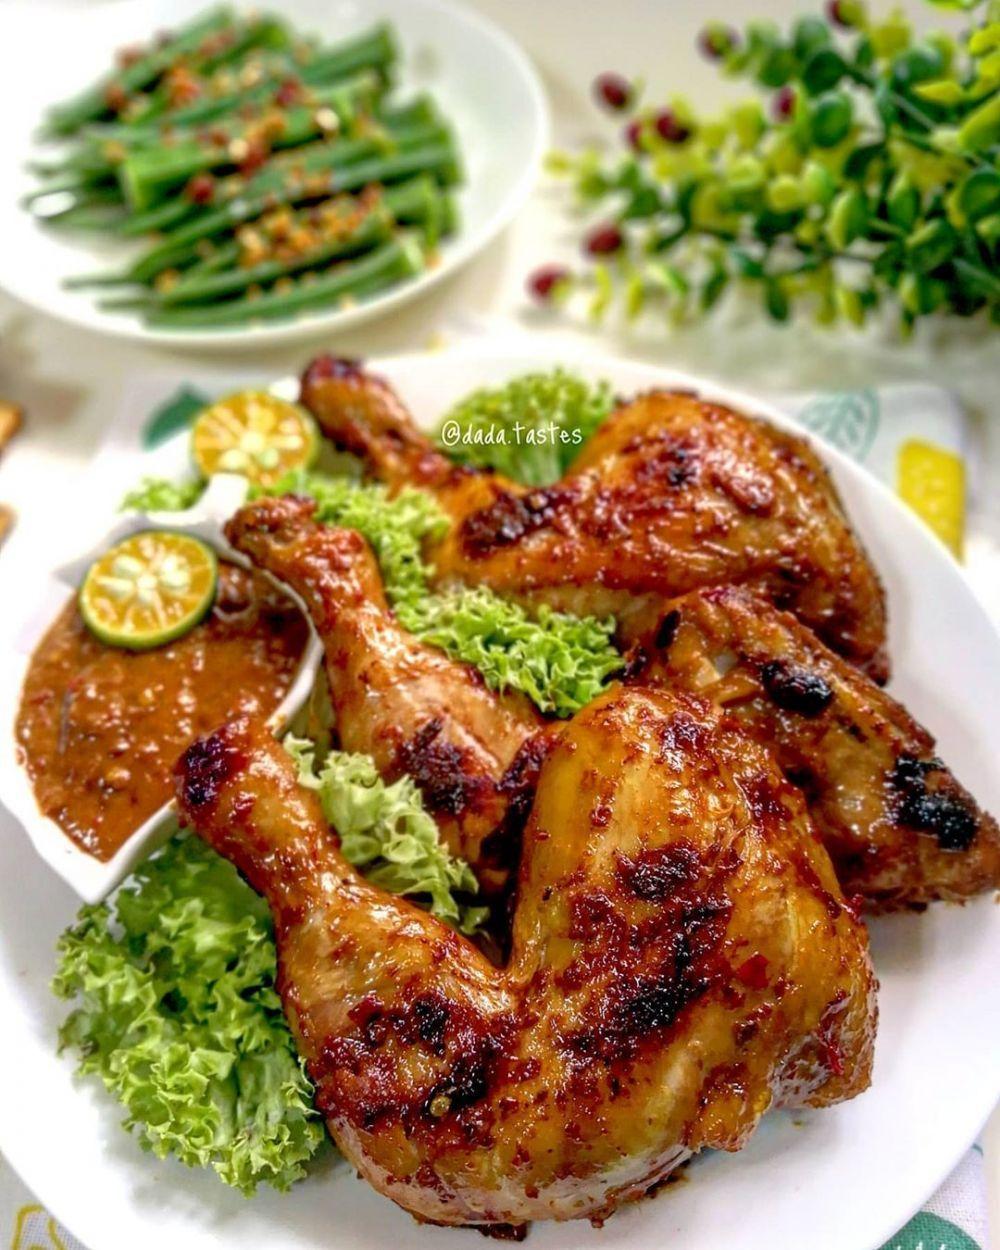 Resep Olahan Ayam Ala Restoran C 2020 Brilio Net Di 2020 Resep Masakan Indonesia Ayam Tandoori